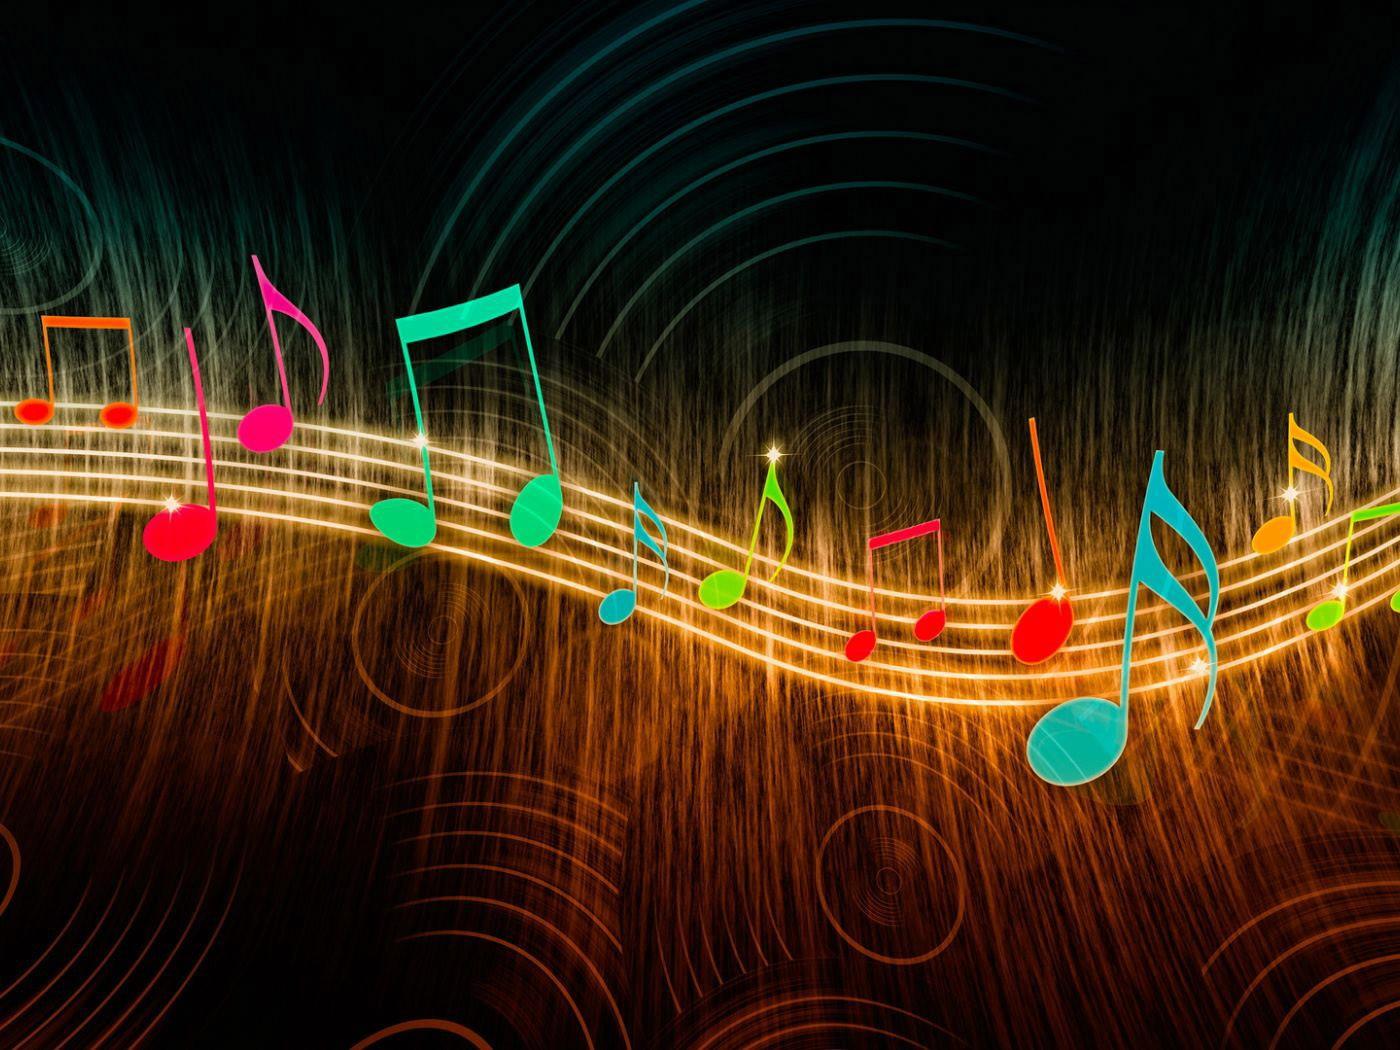 Музыка на поздравление минус